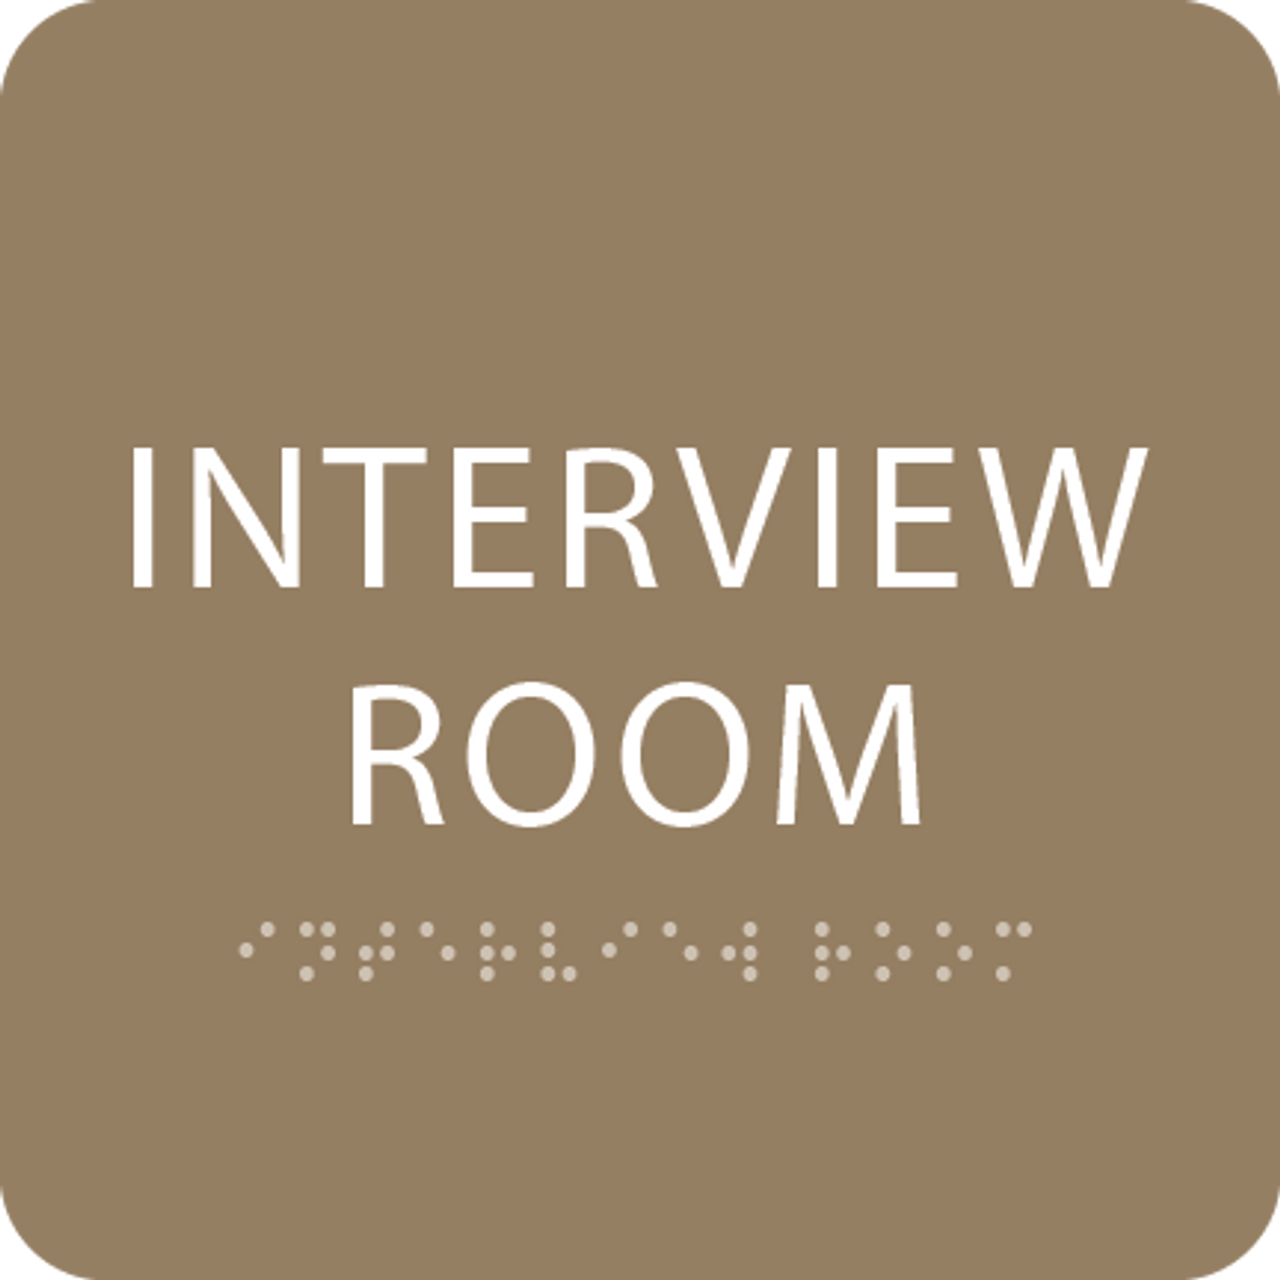 Brown Interview Room ADA Sign